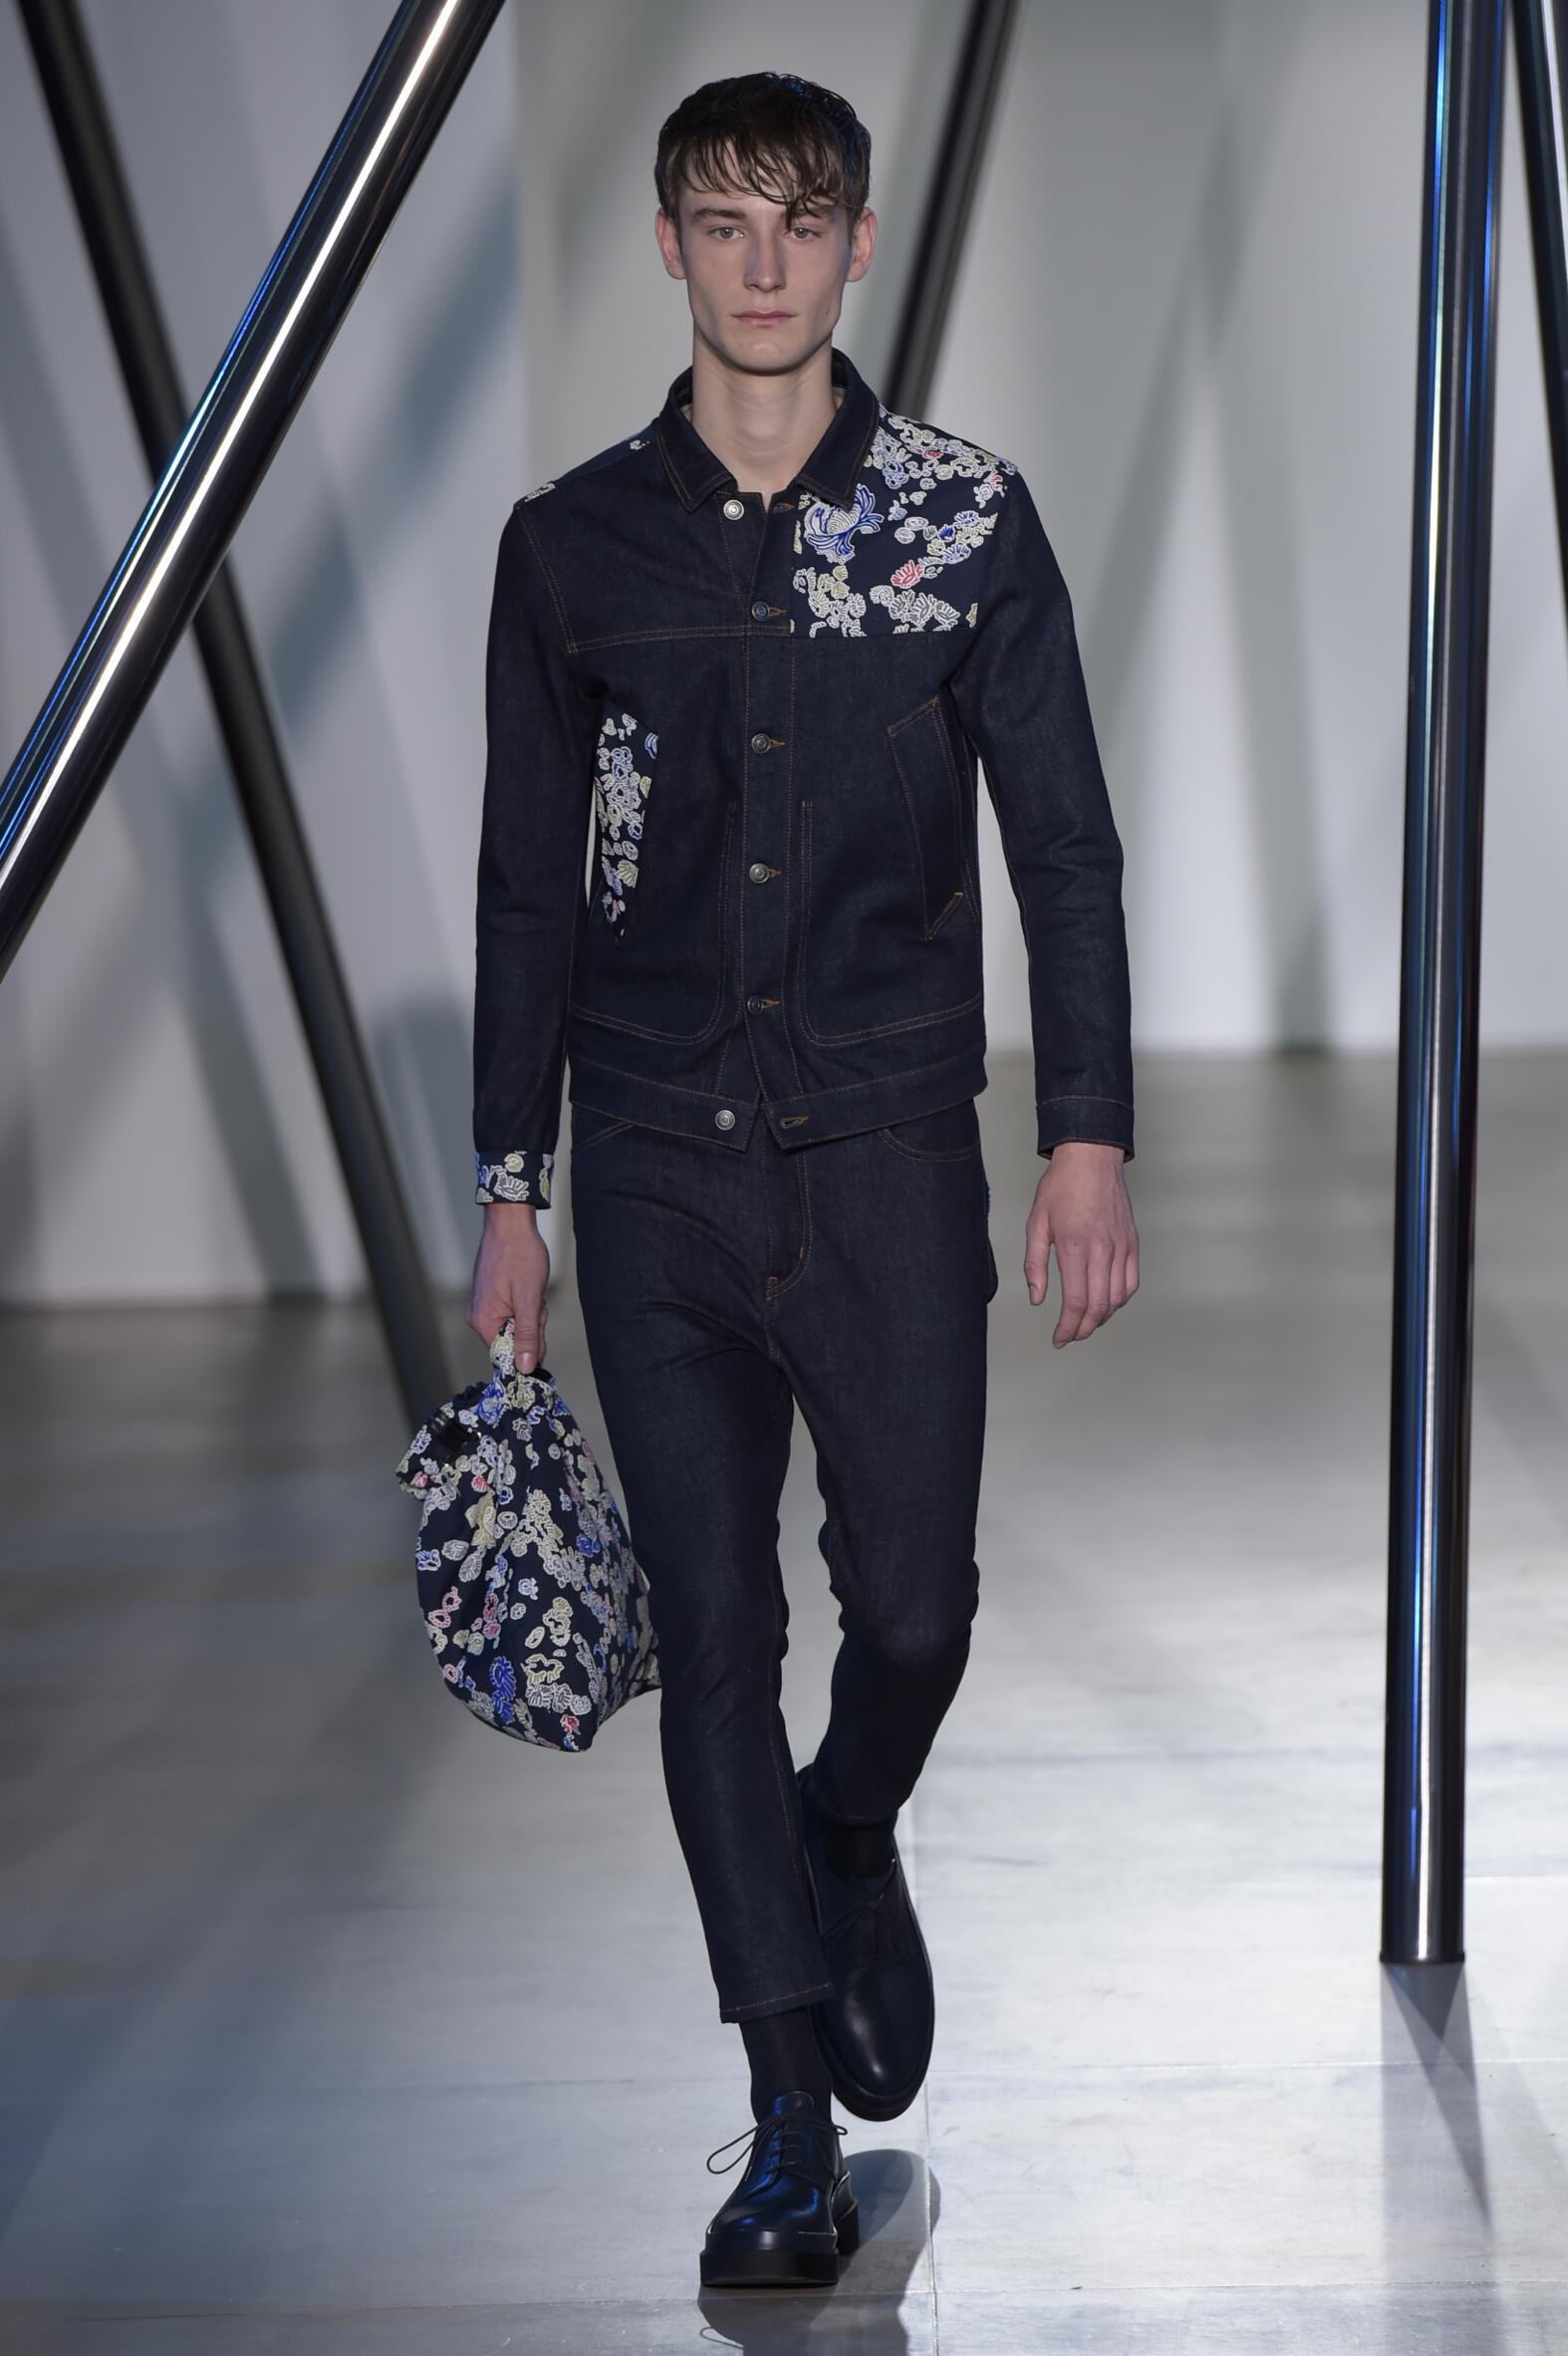 Fashion Menswear Jil Sander Collection Catwalk